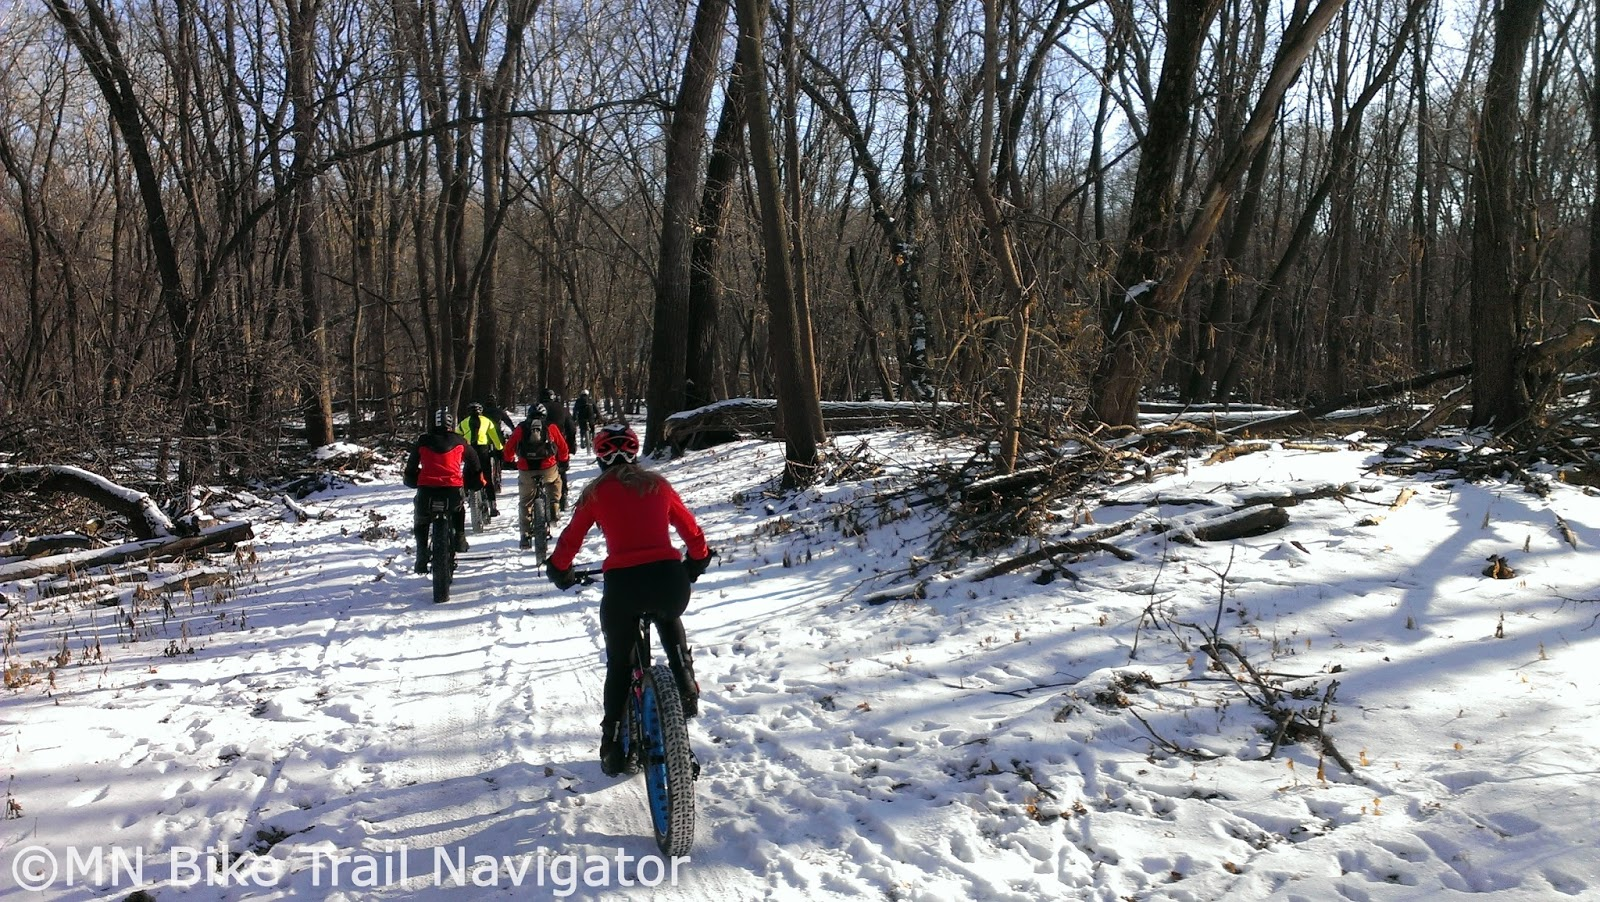 Mn Bike Trail Navigator Winter 16 17 Mn Fatbike Events